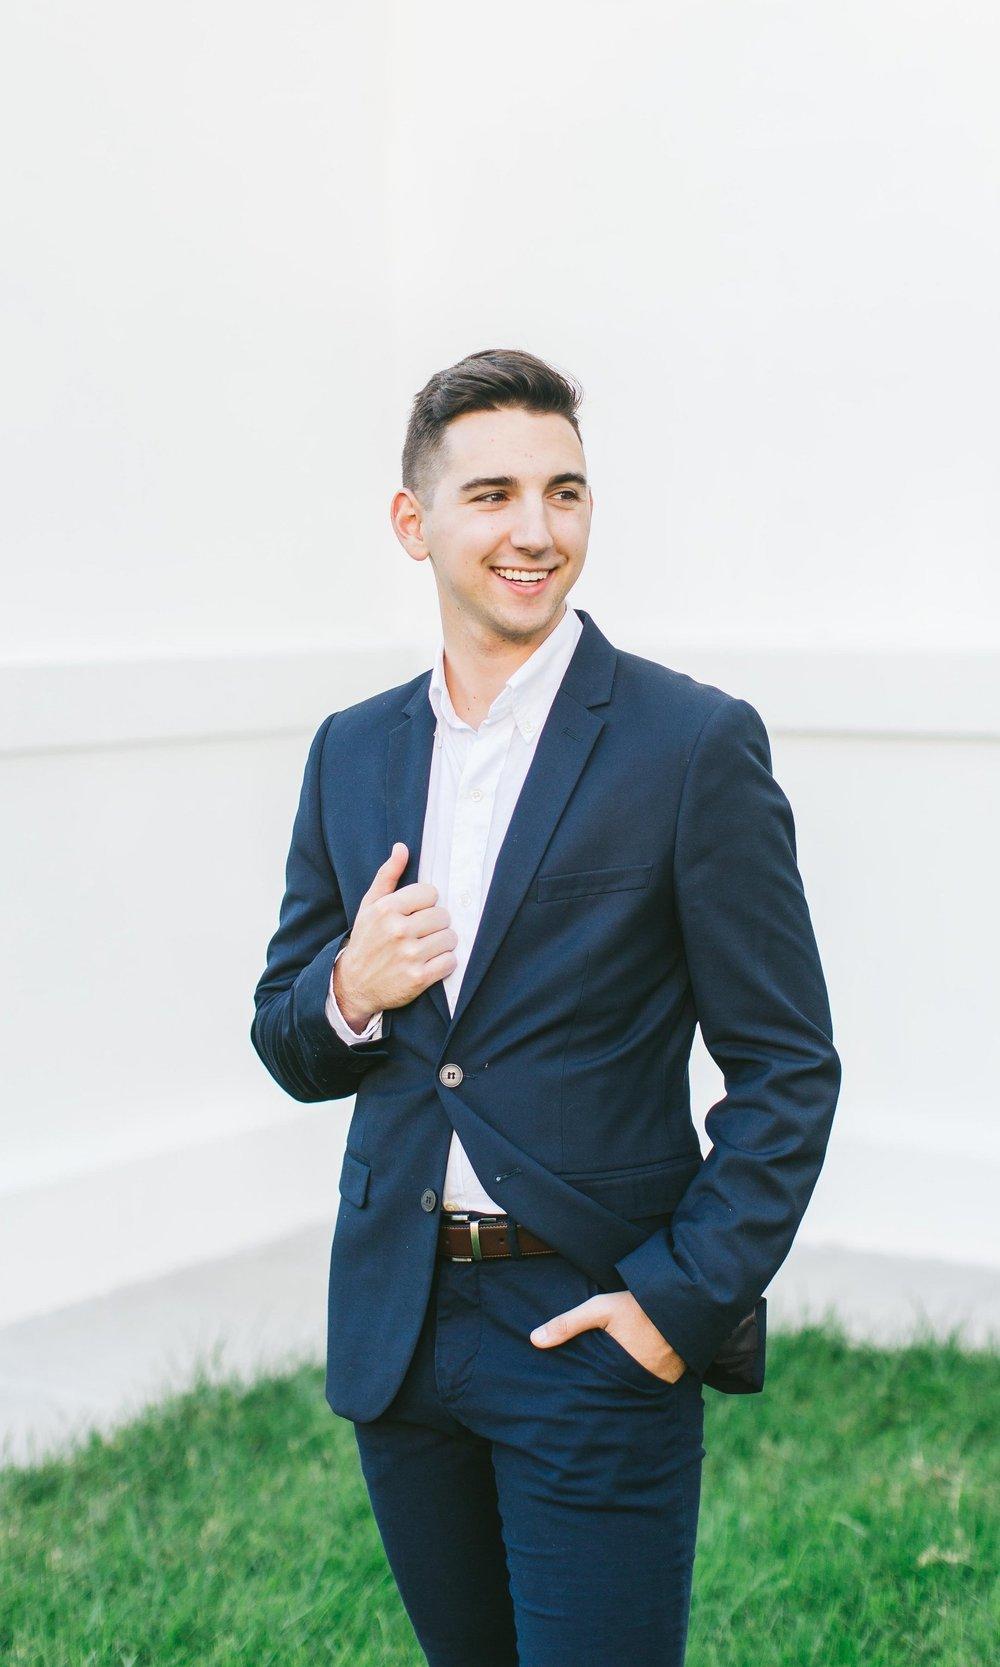 Joshua Bryan Medlin - Owner/Filmmaker